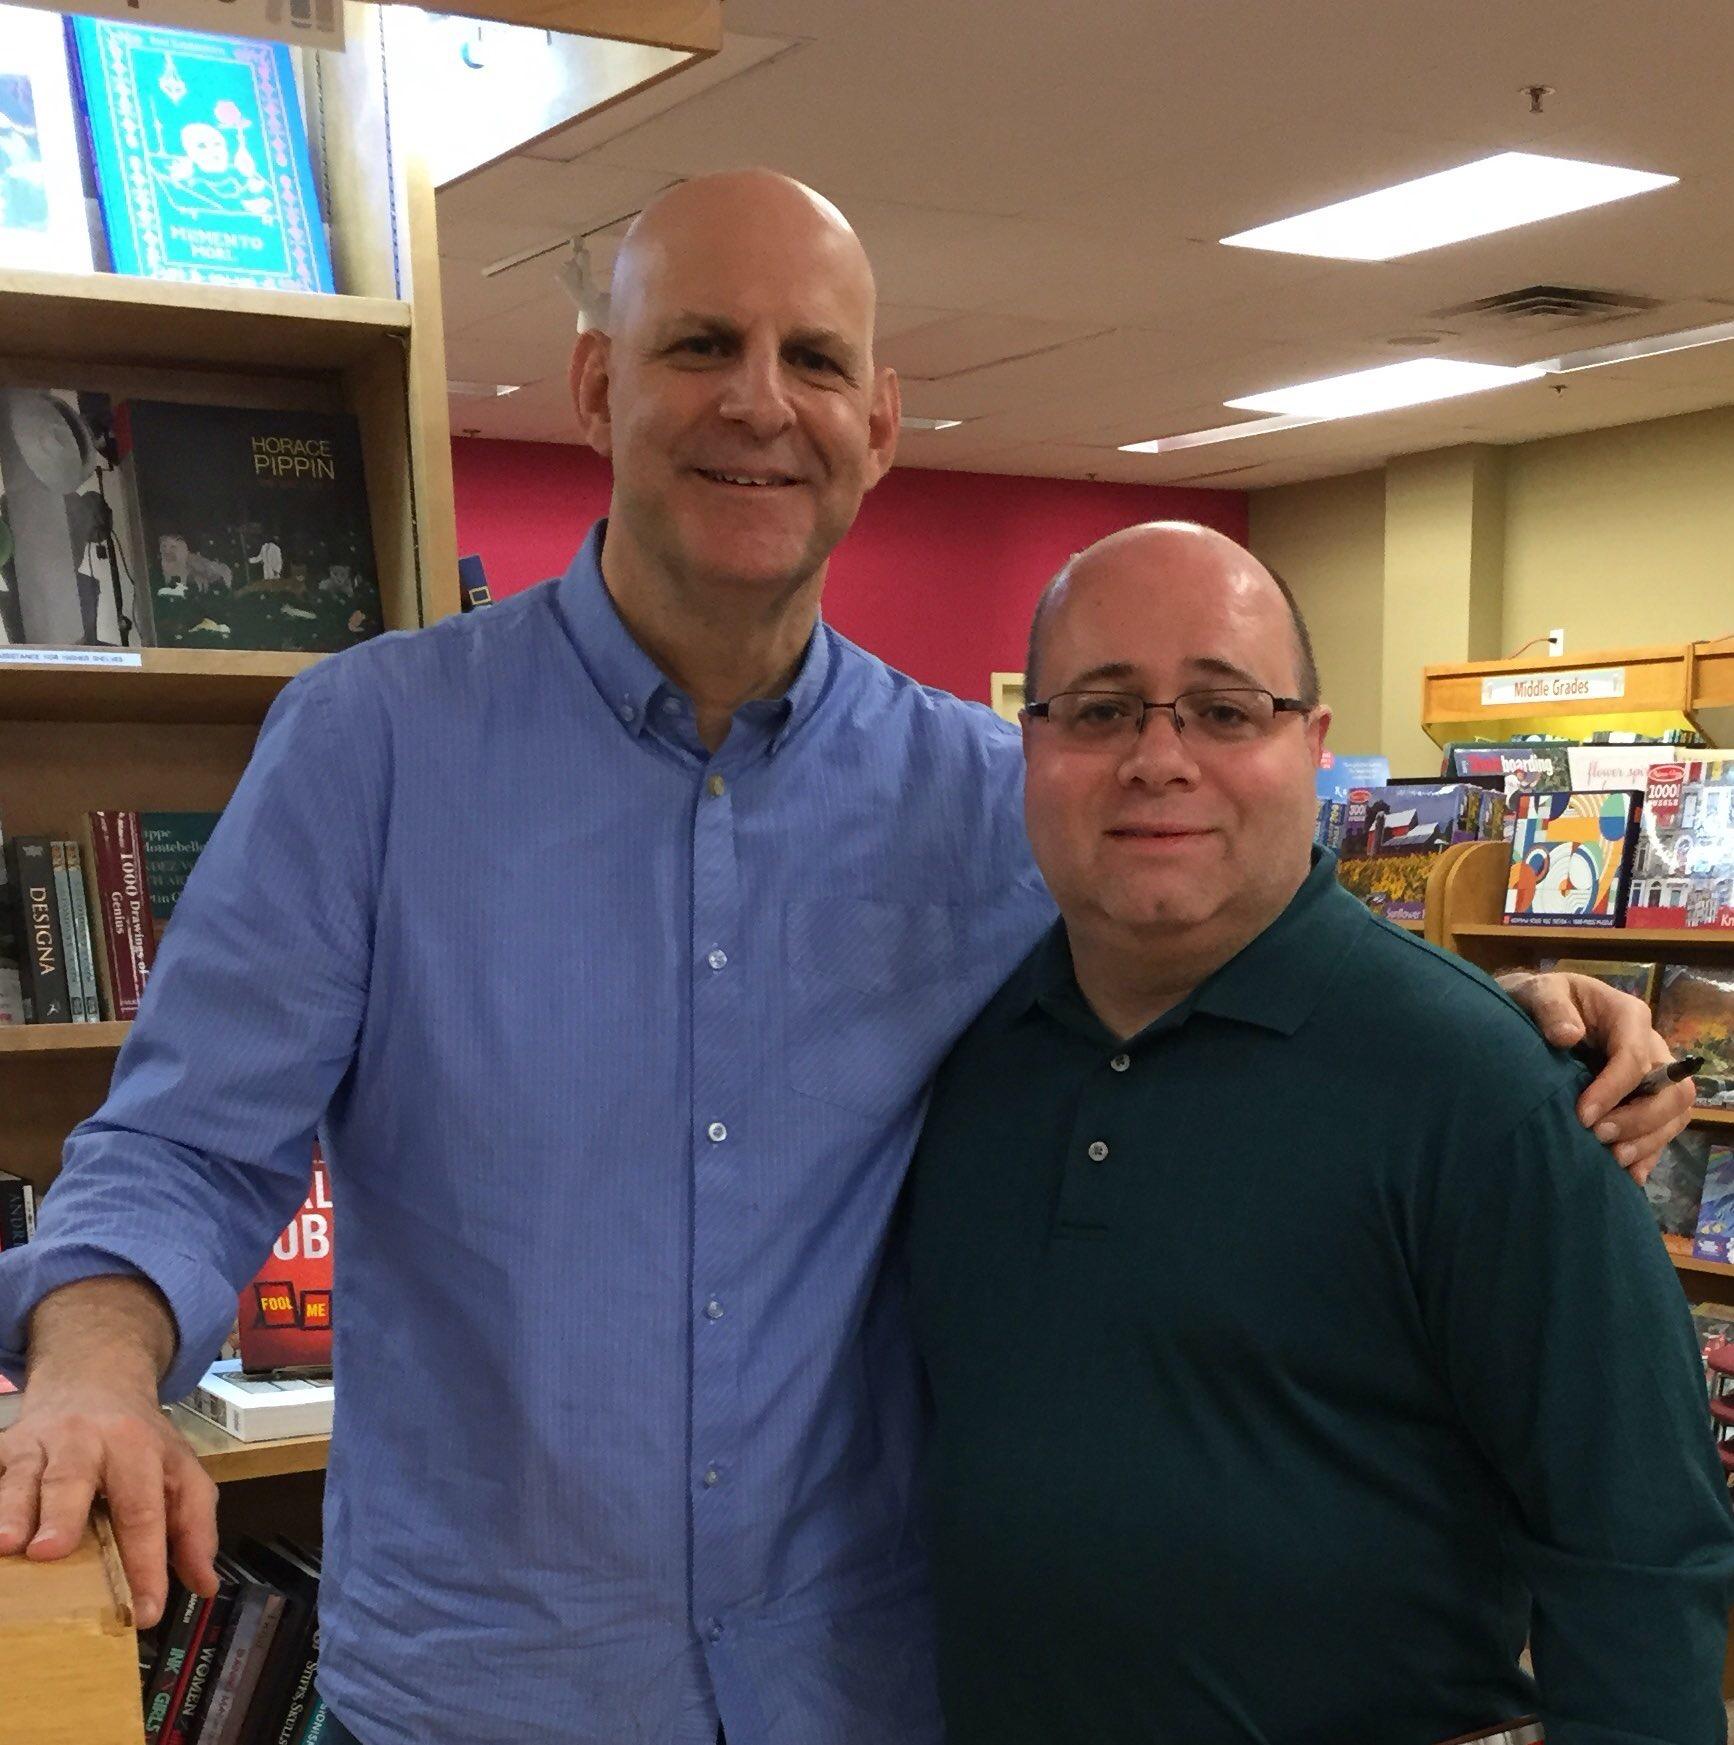 With Harlen Coben